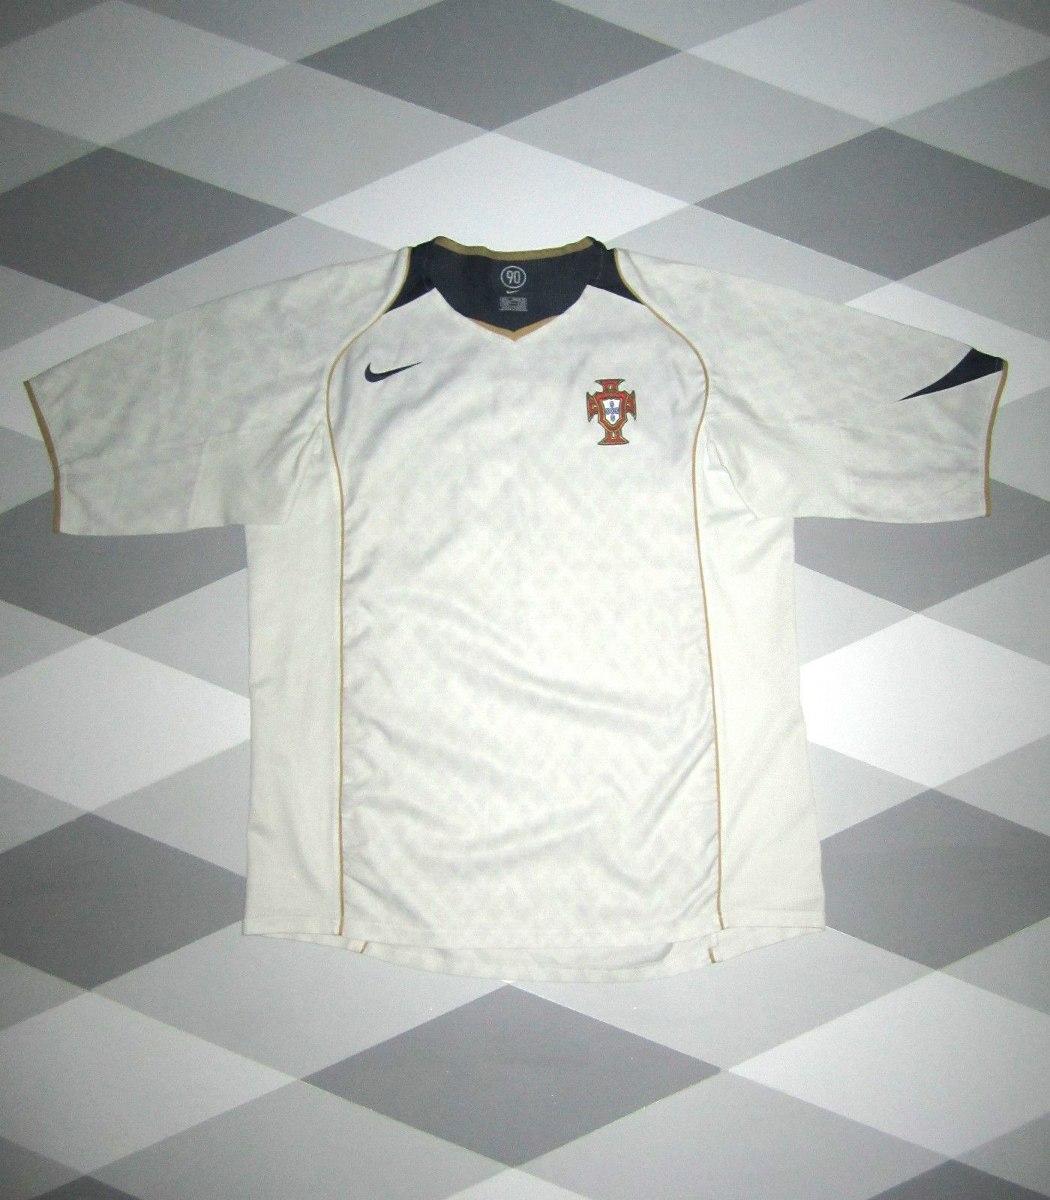 c736131478d15 camisa portugal nike euro 2004 made portugal autentica. Carregando zoom.